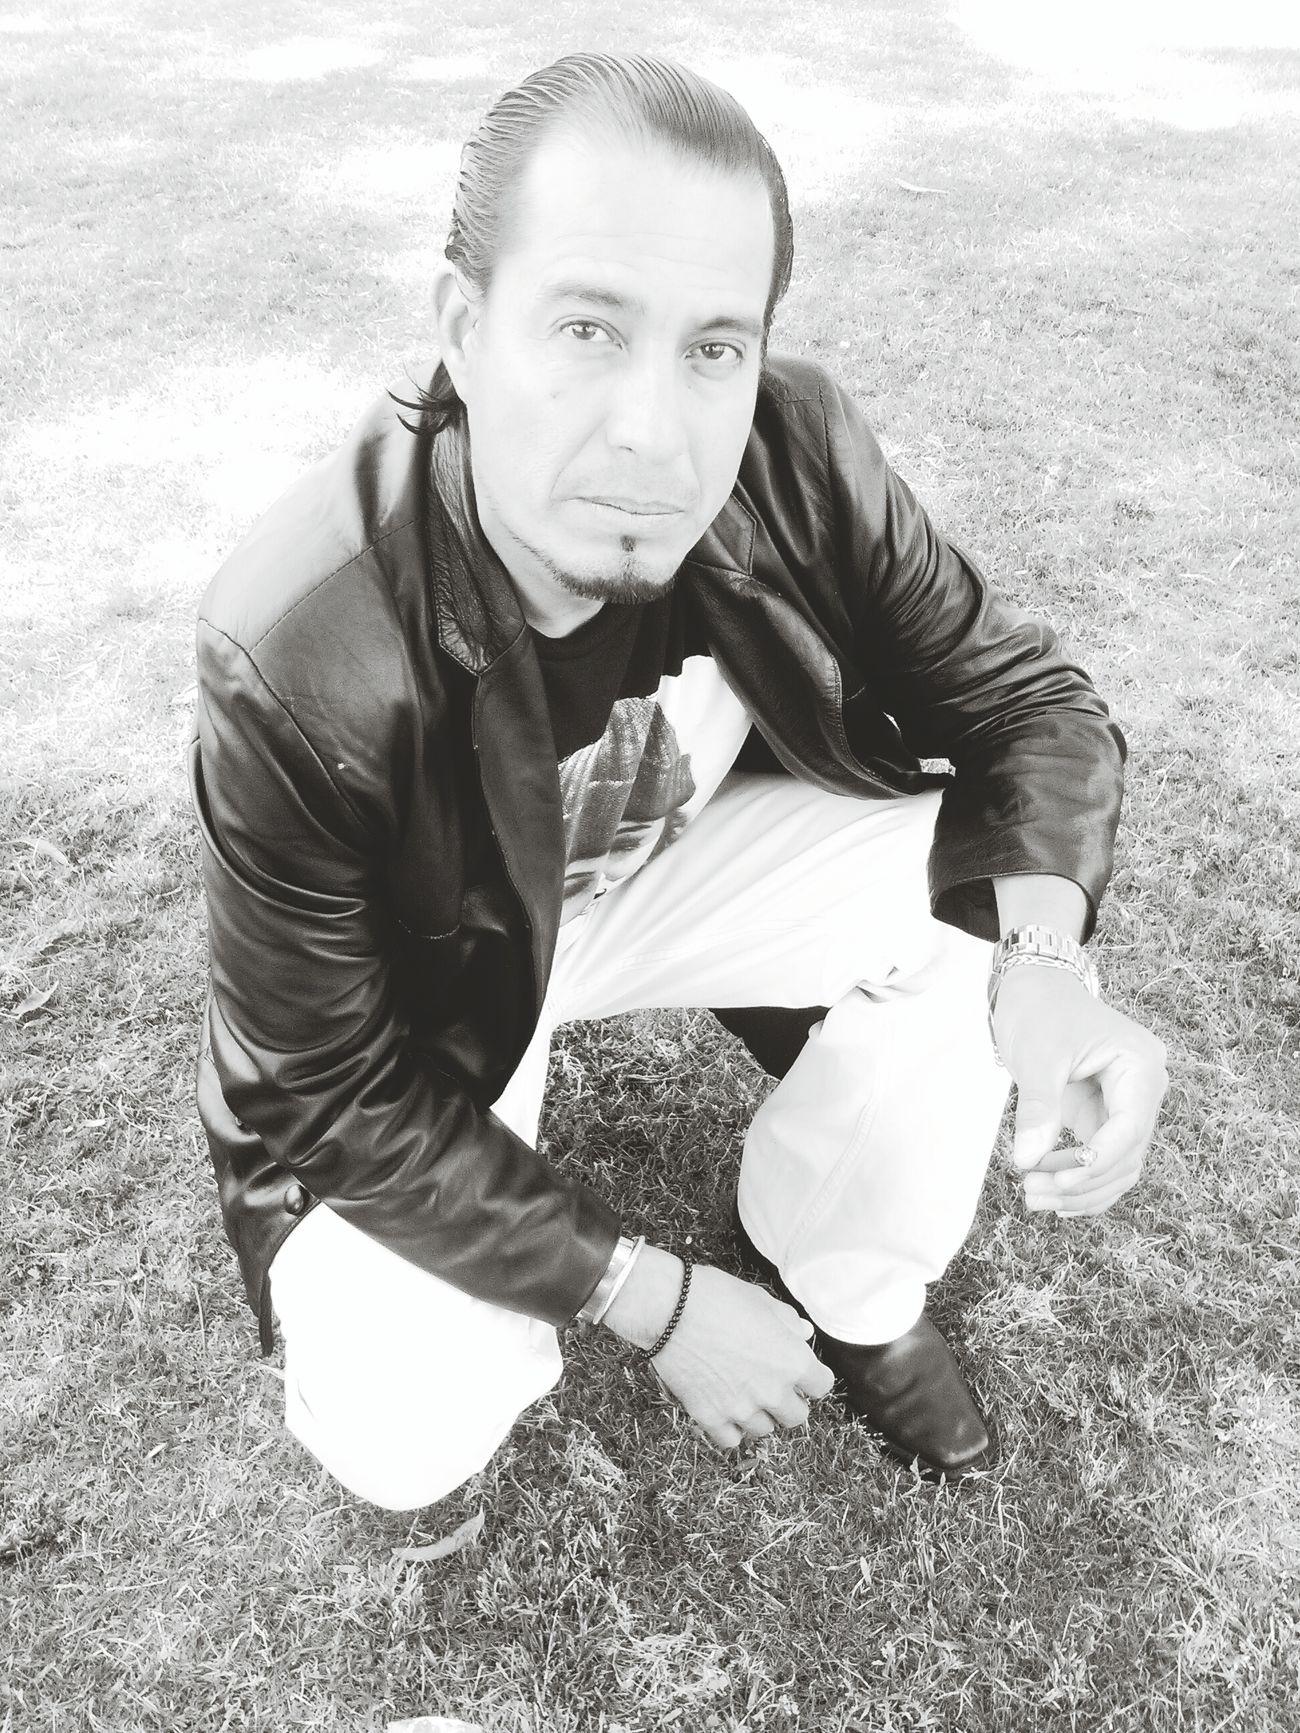 Asawa Esposo Mahal Relaxing Check This Out Hanging Out Hello World Shades Of Grey